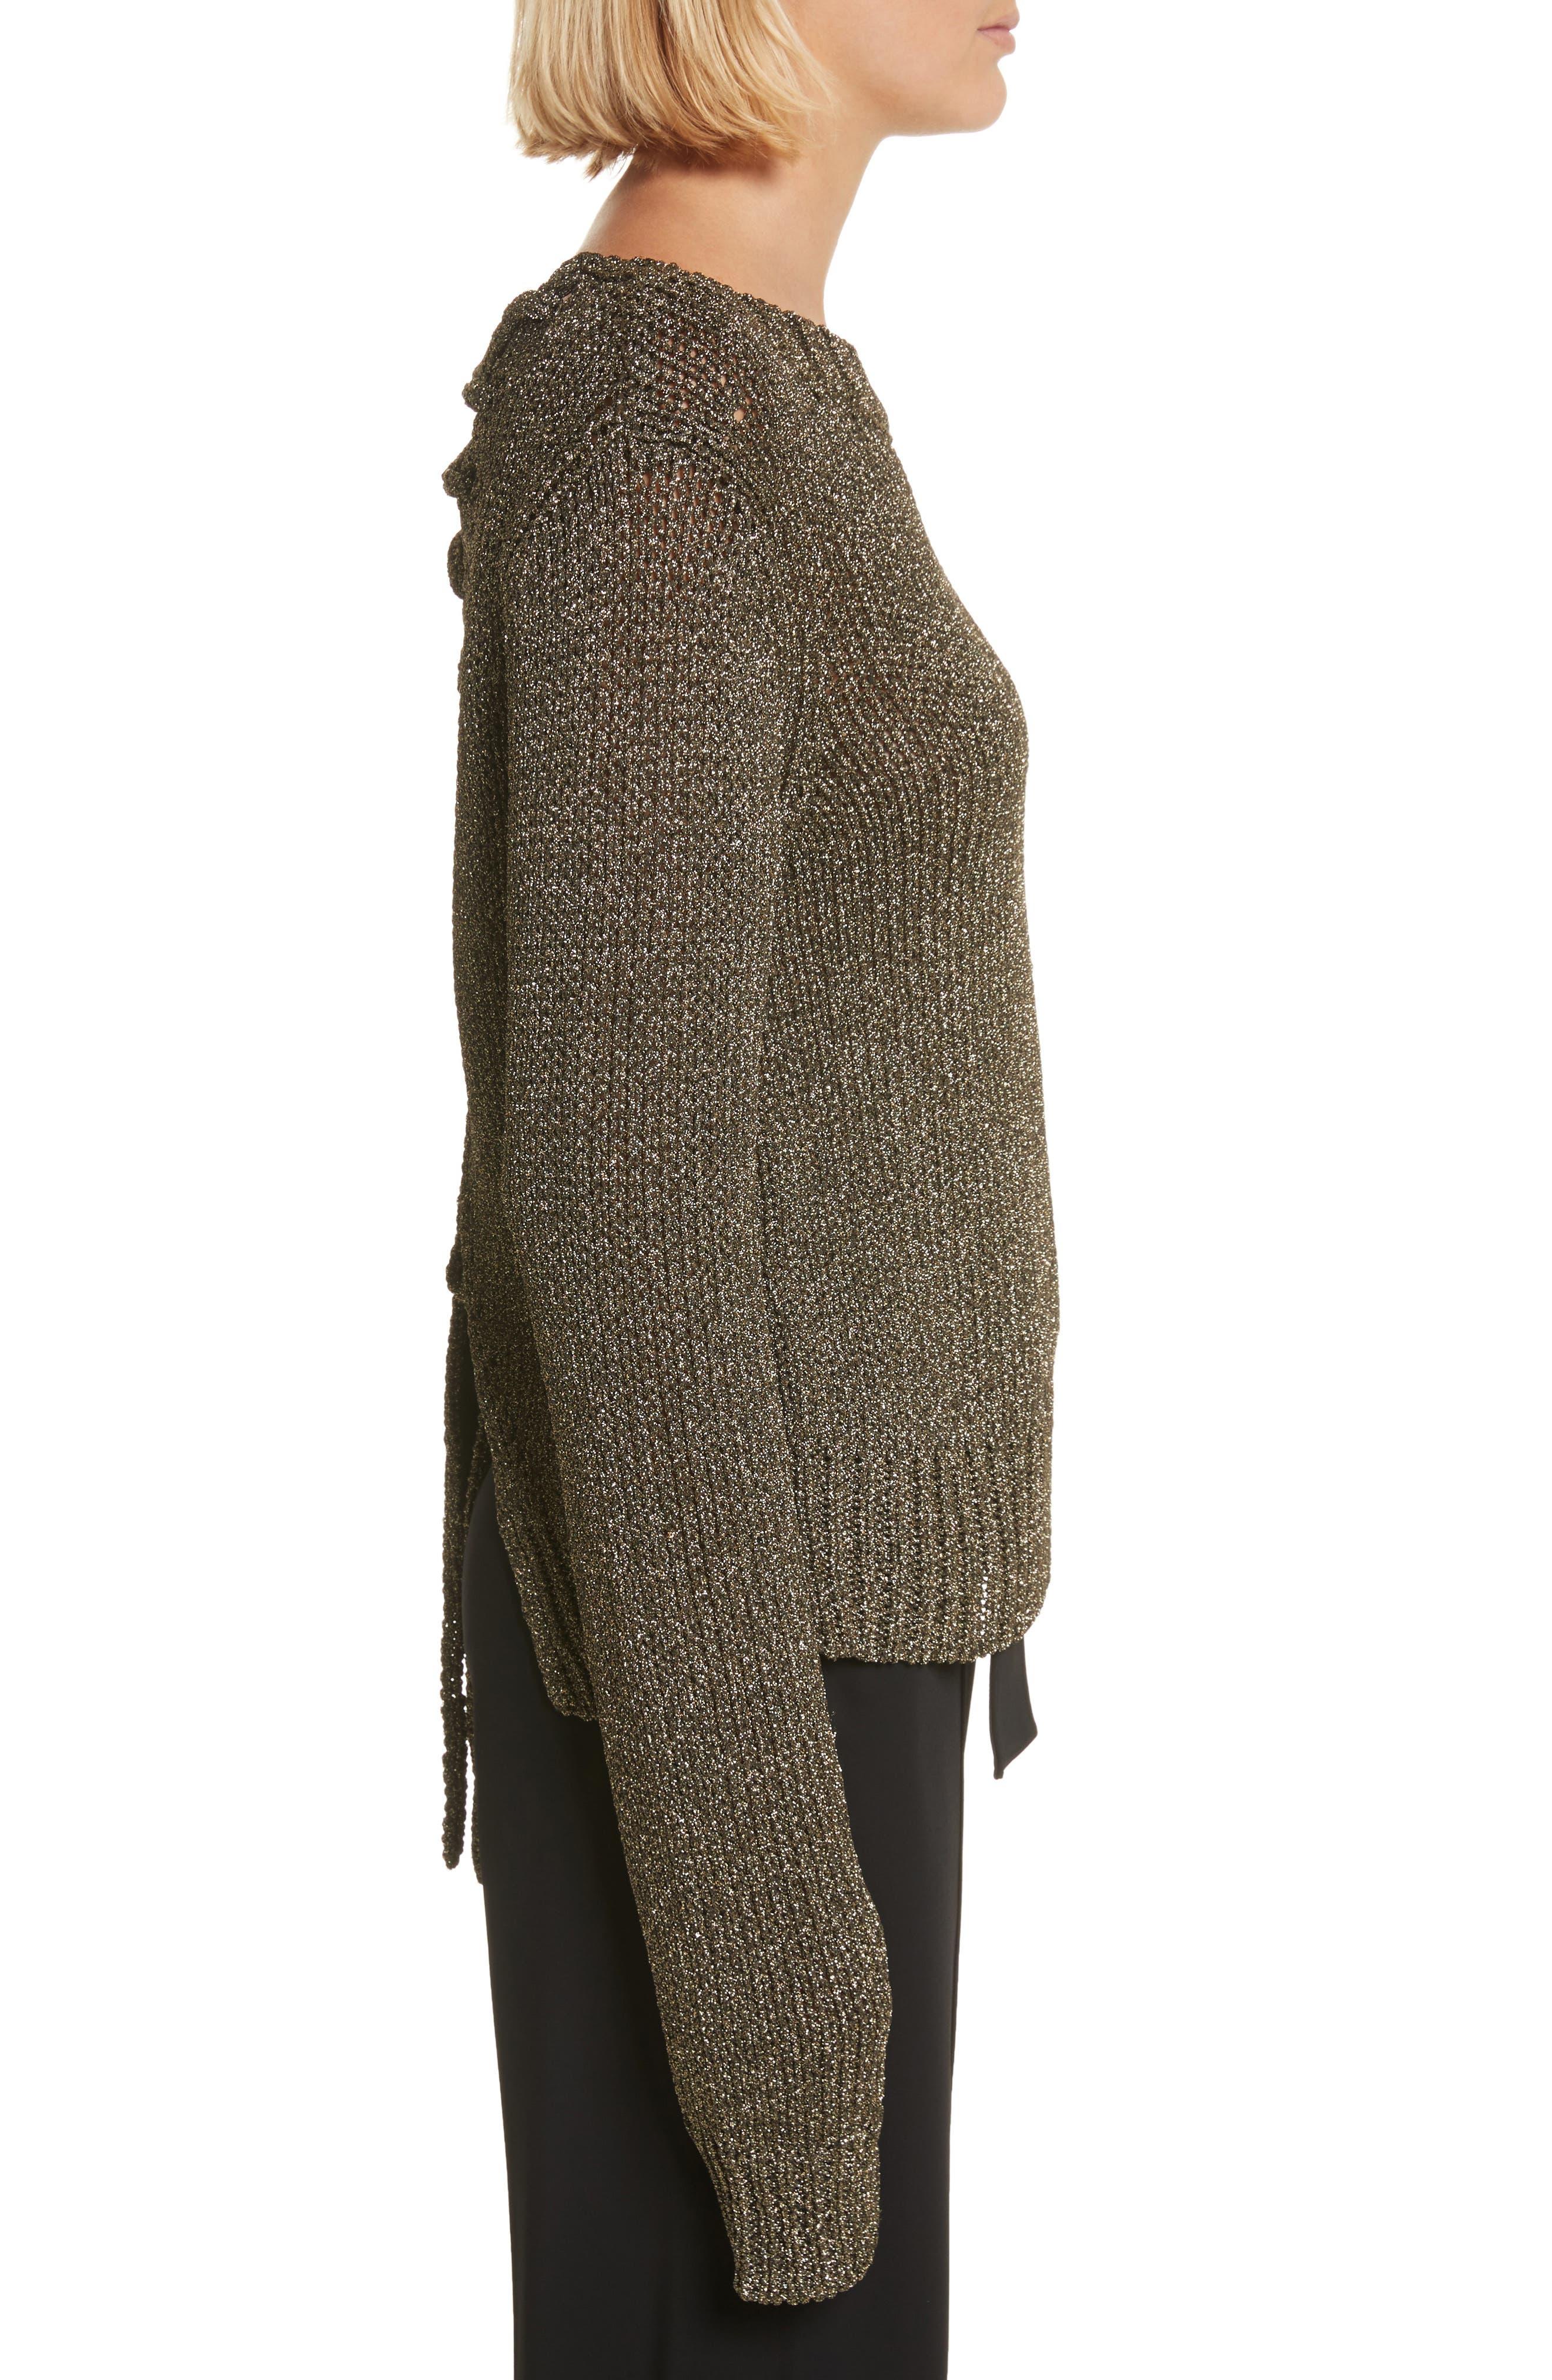 Marjorie Lace-Up Back Sweater,                             Alternate thumbnail 3, color,                             010